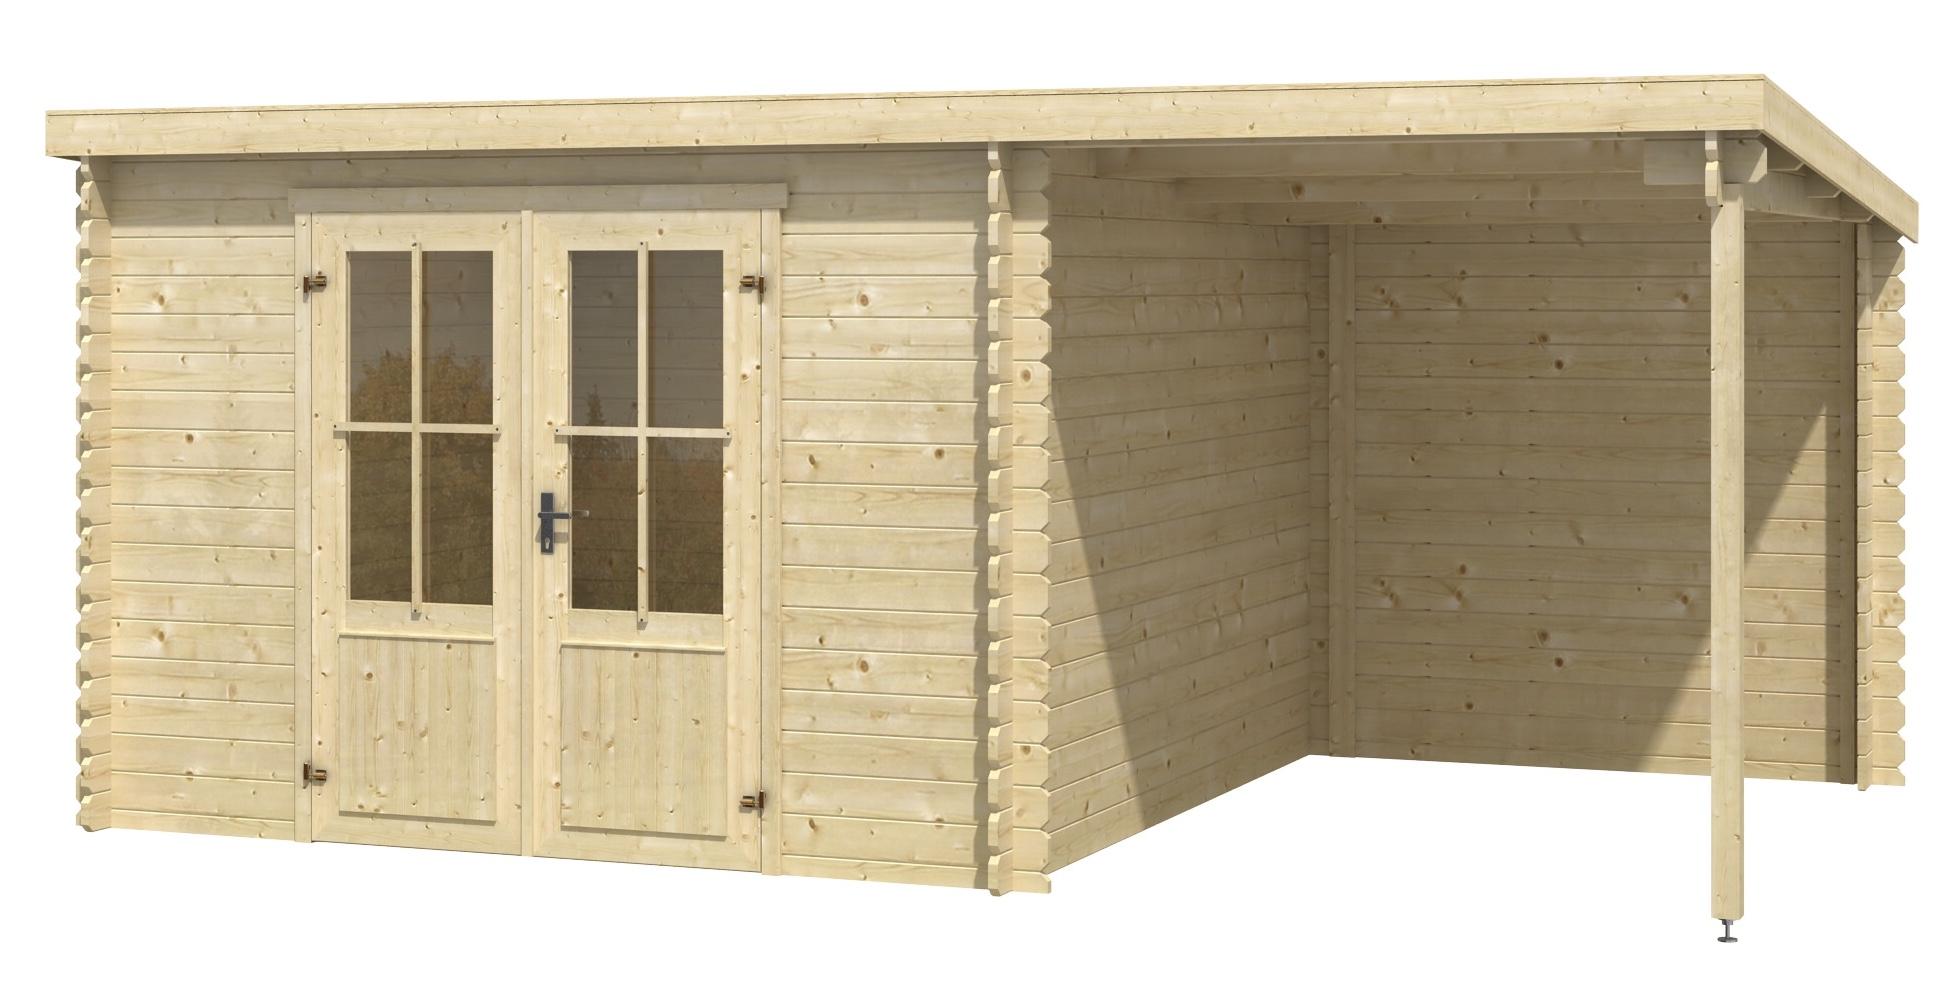 gartenhaus tampa novia jelle g nstig kaufen online shop. Black Bedroom Furniture Sets. Home Design Ideas